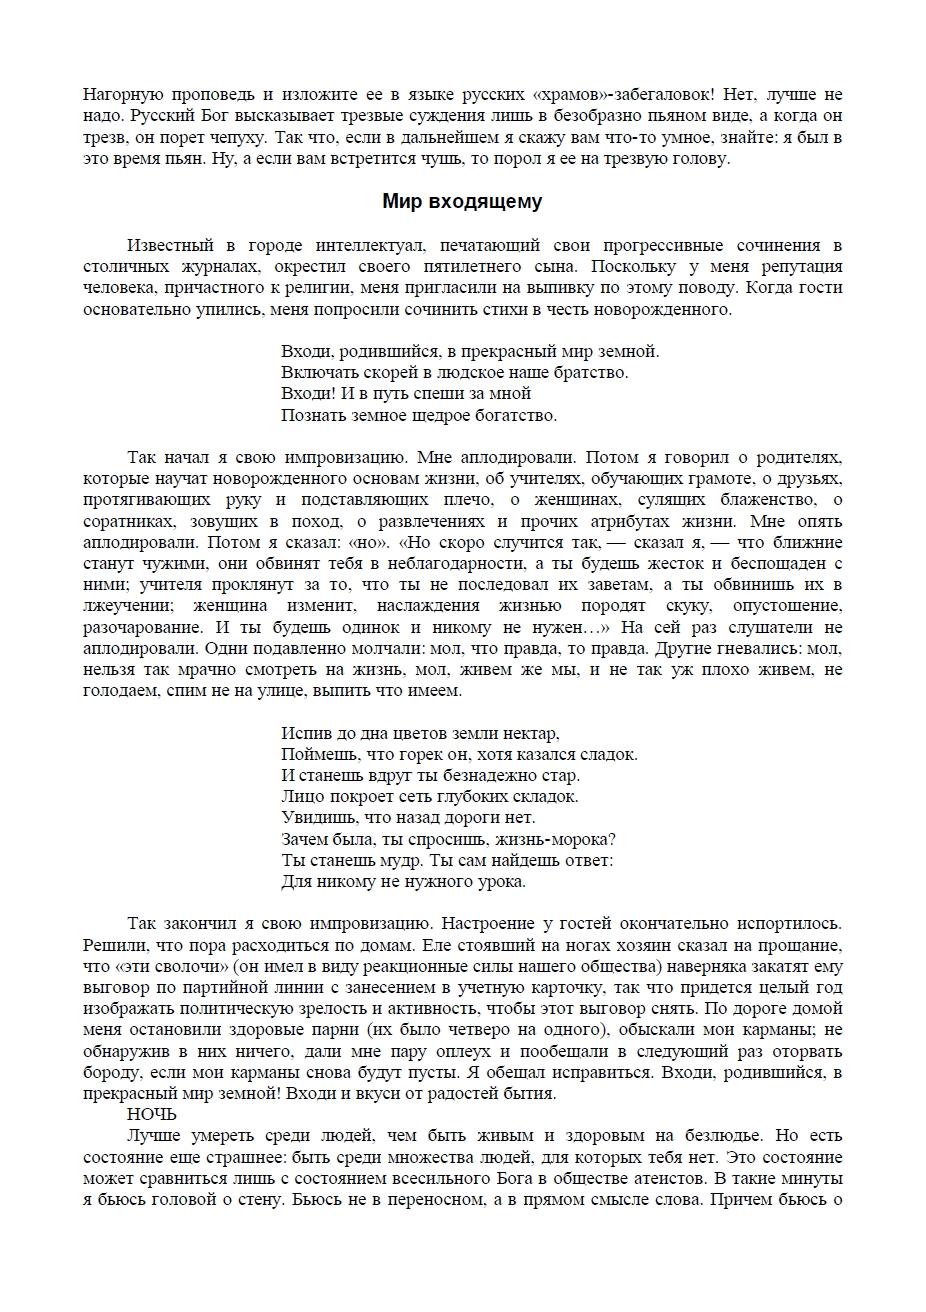 http://images.vfl.ru/ii/1407686351/d5b11733/5957343.jpg